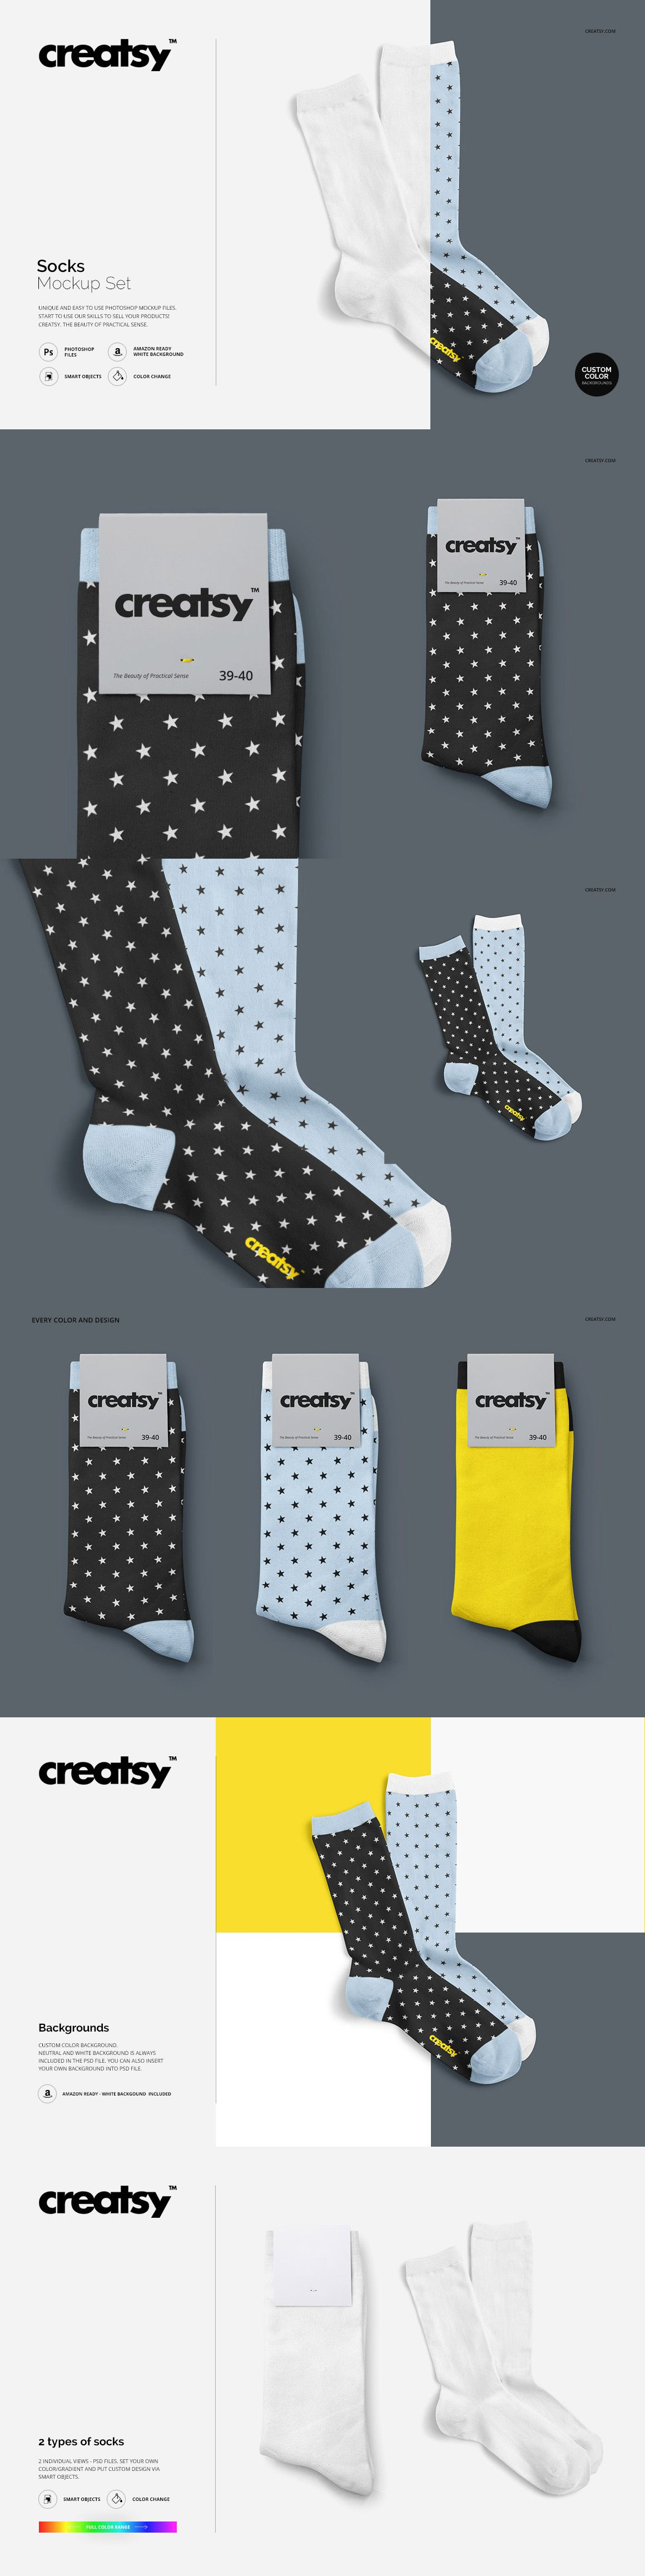 Download Socks Mockup Set On Behance Socks Socks Women Mockup